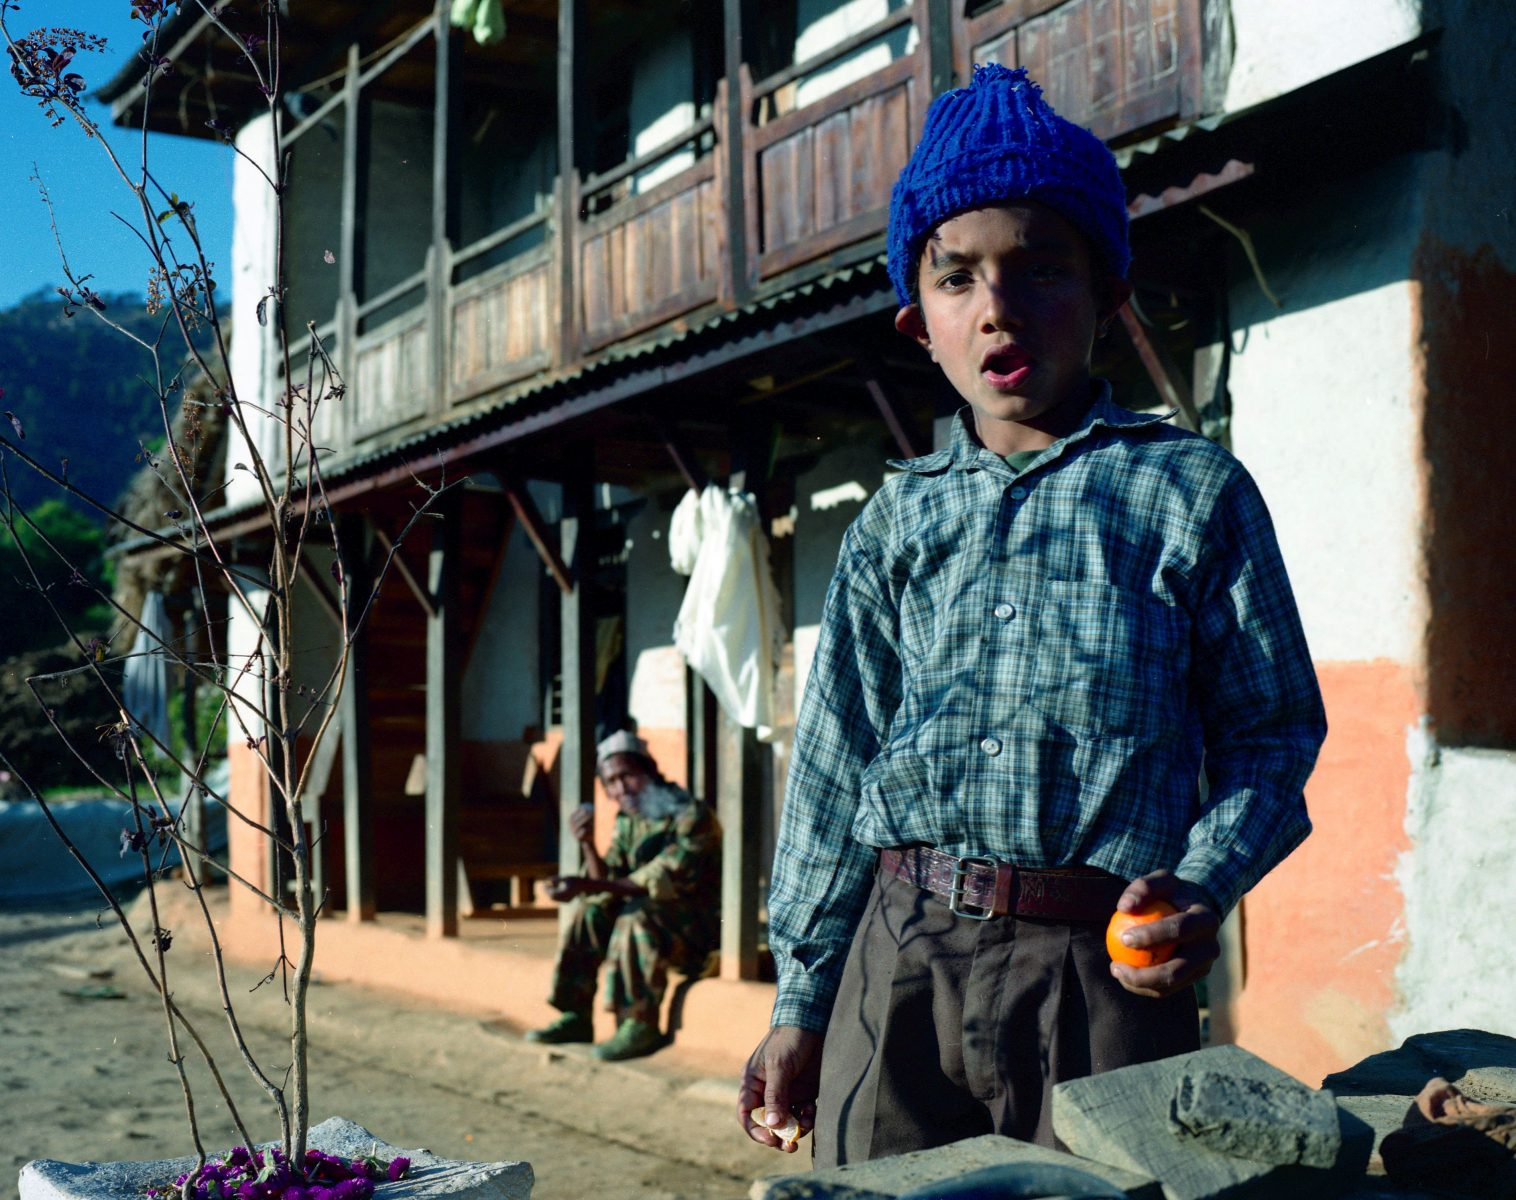 Nepal orange and blue hat